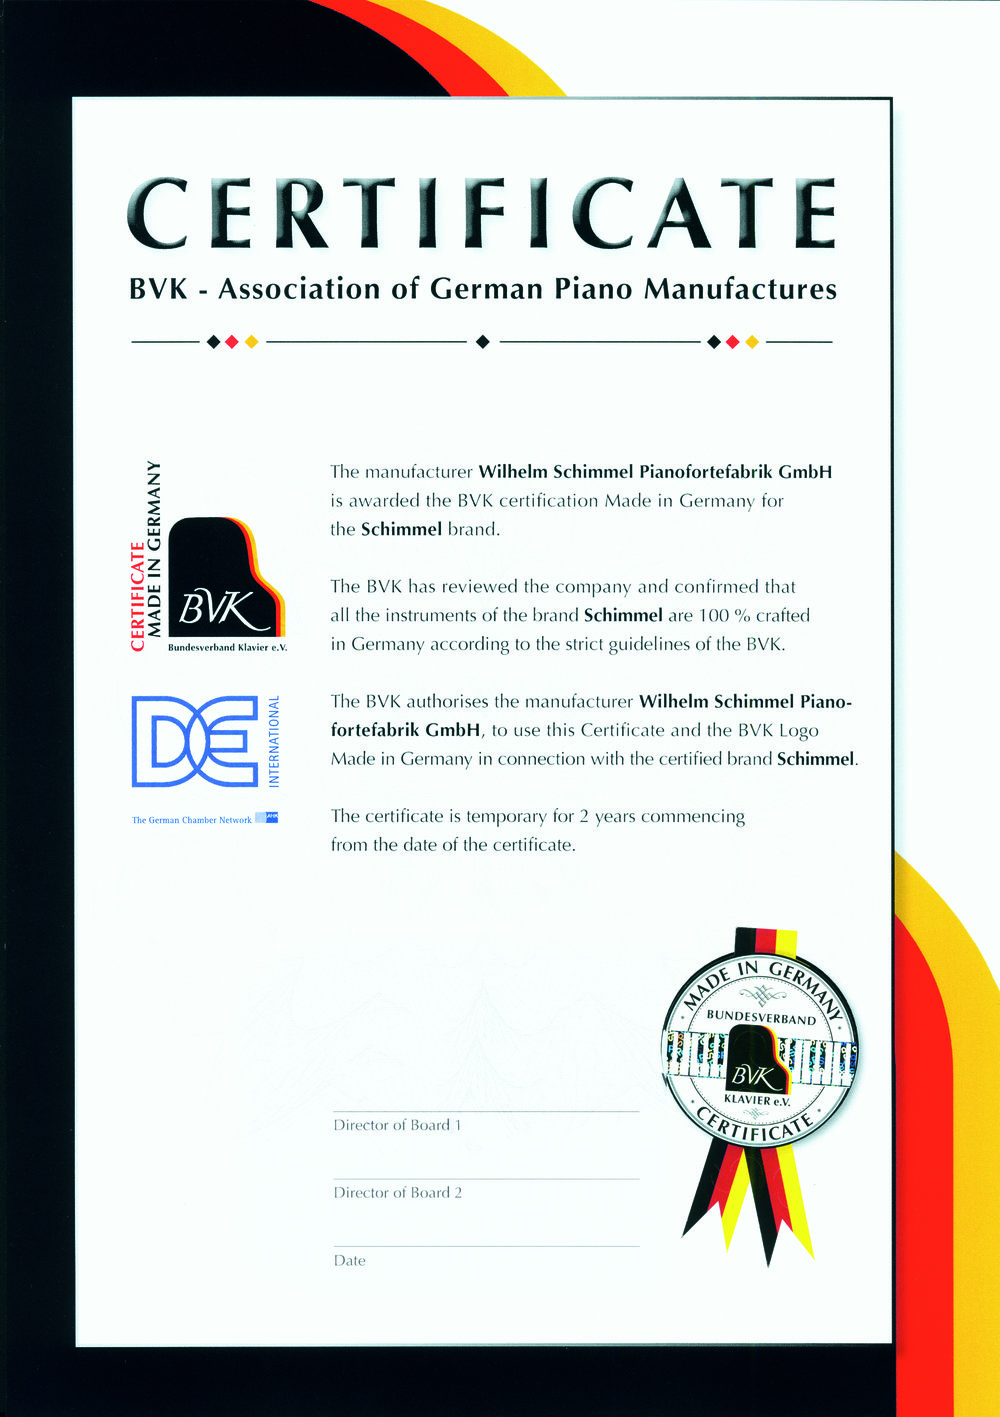 Zertifikat_BVK-GER_engl.jpg